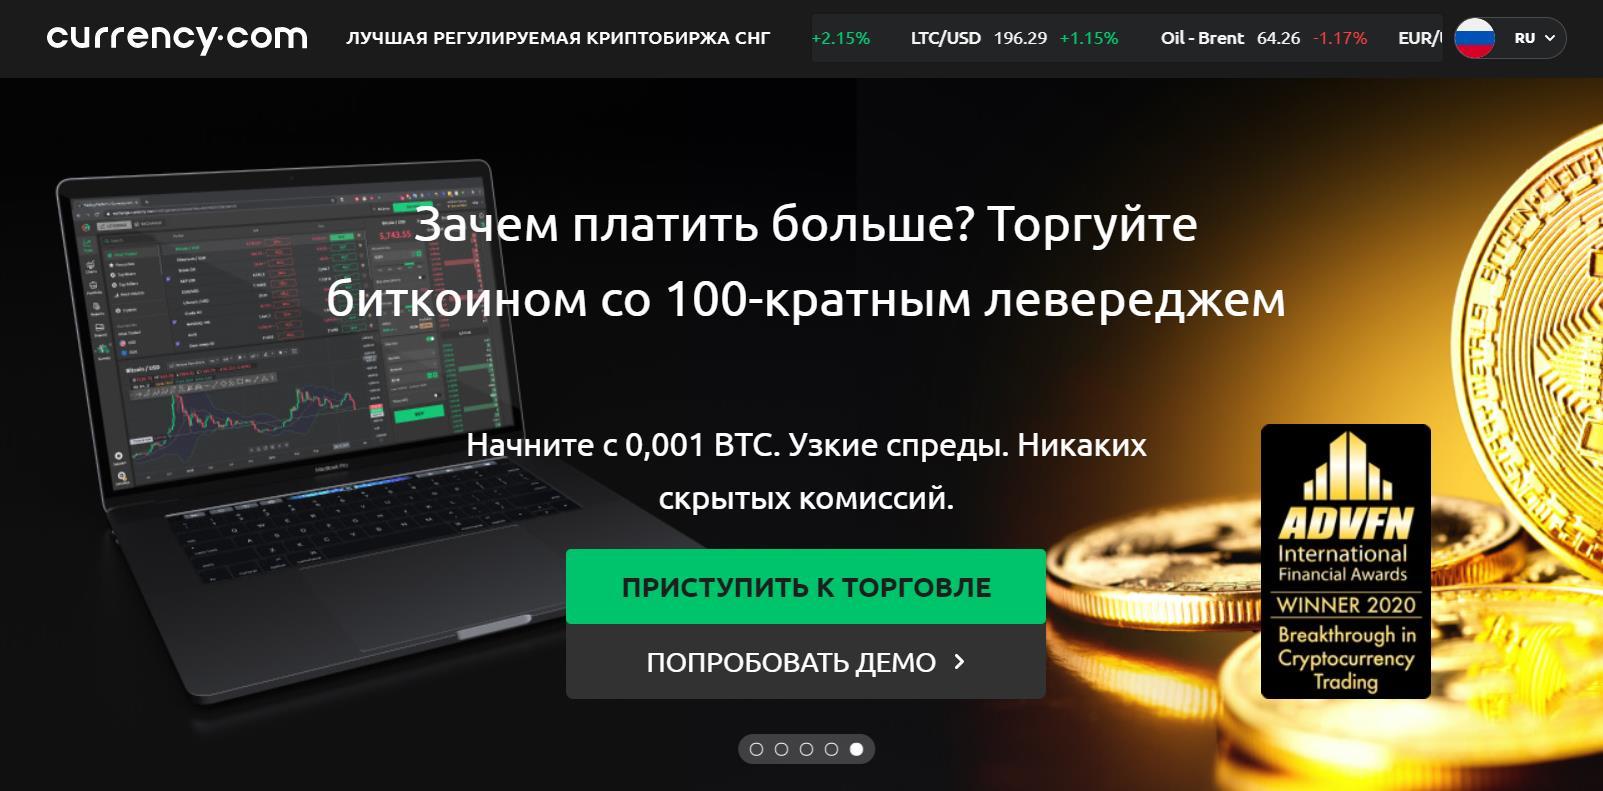 обзор криптобиржи currency.com